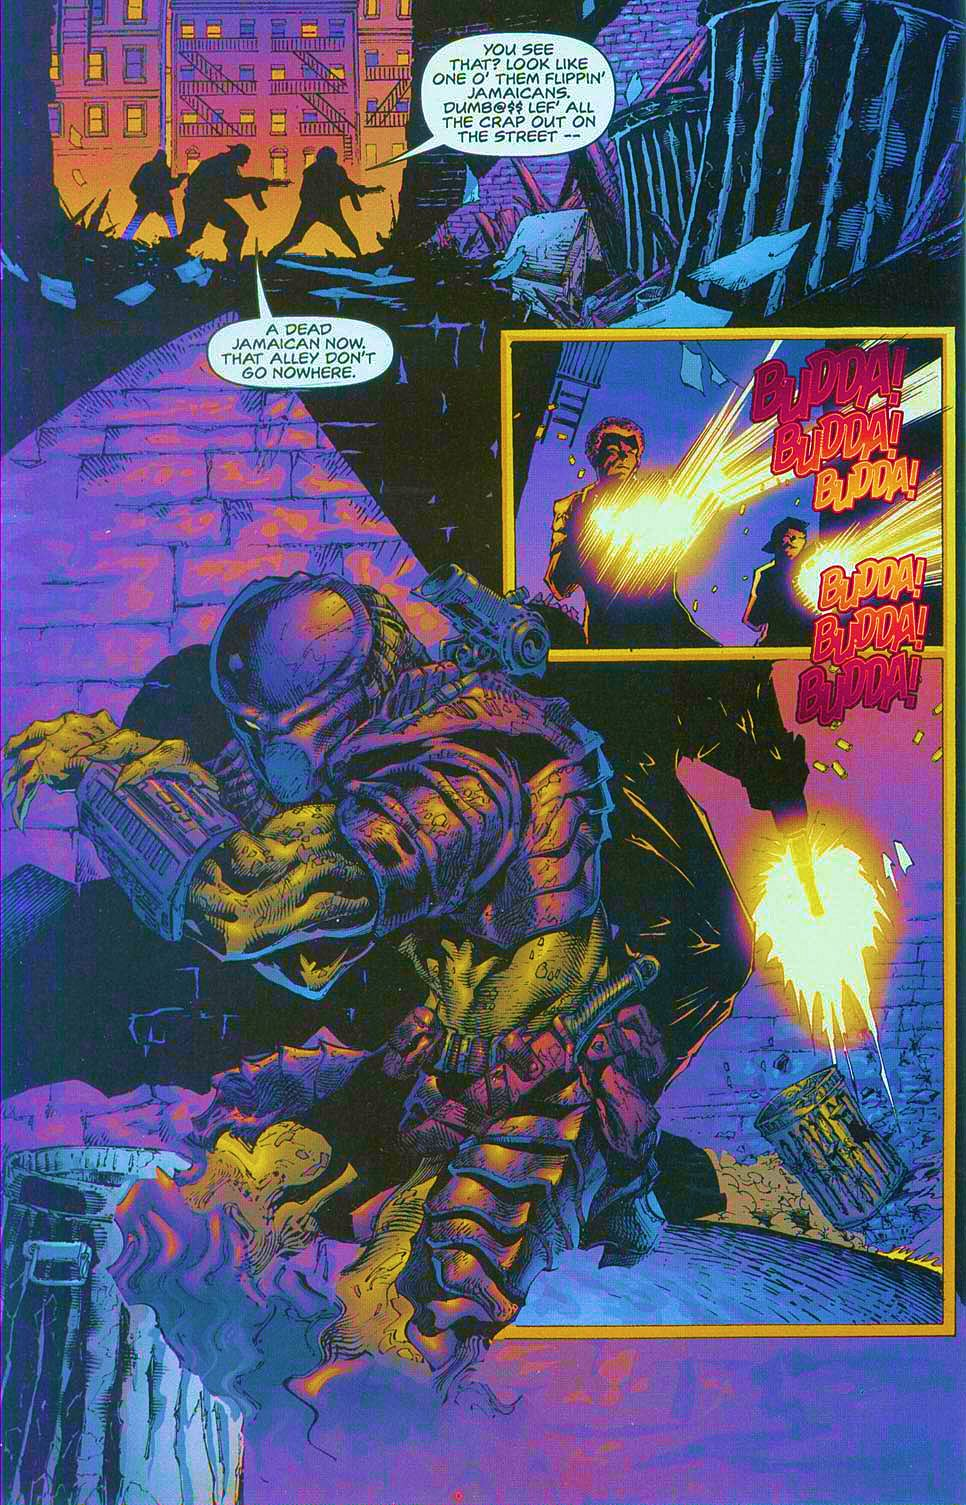 Read online Overkill: Witchblade/Aliens/Darkness/Predator comic -  Issue #1 - 25